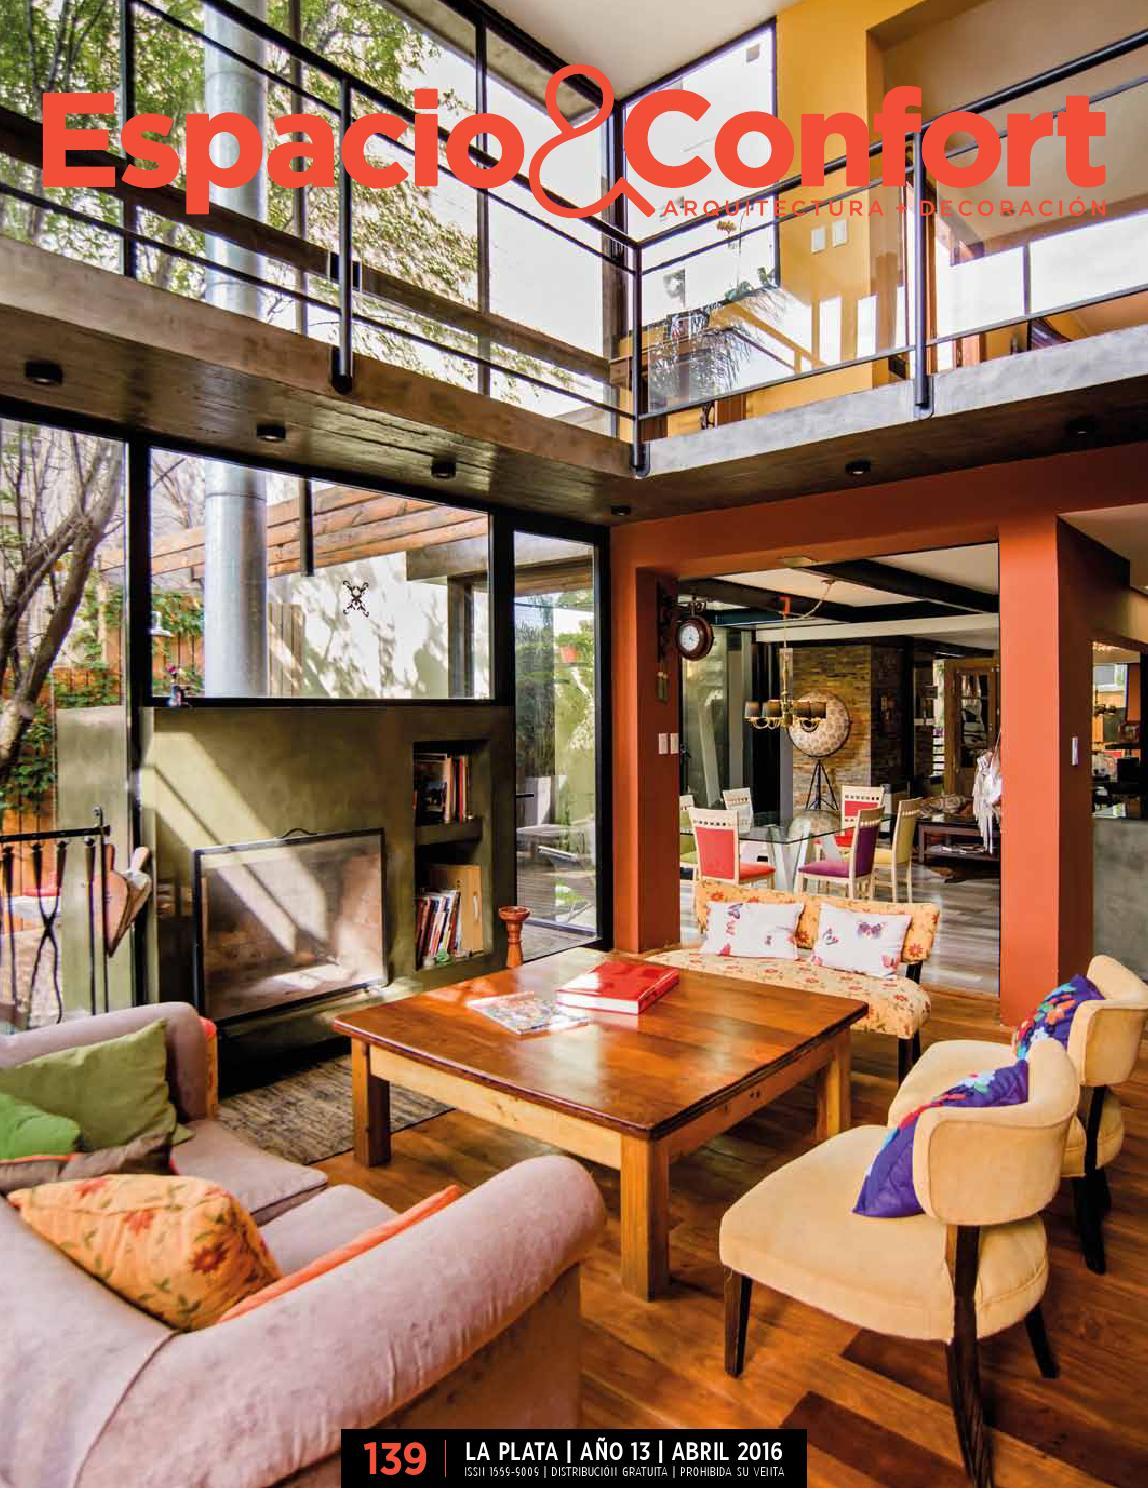 139 Lp Abril By Revista Espacio Confort Arquitectura  # Muebles Peaje Hudson